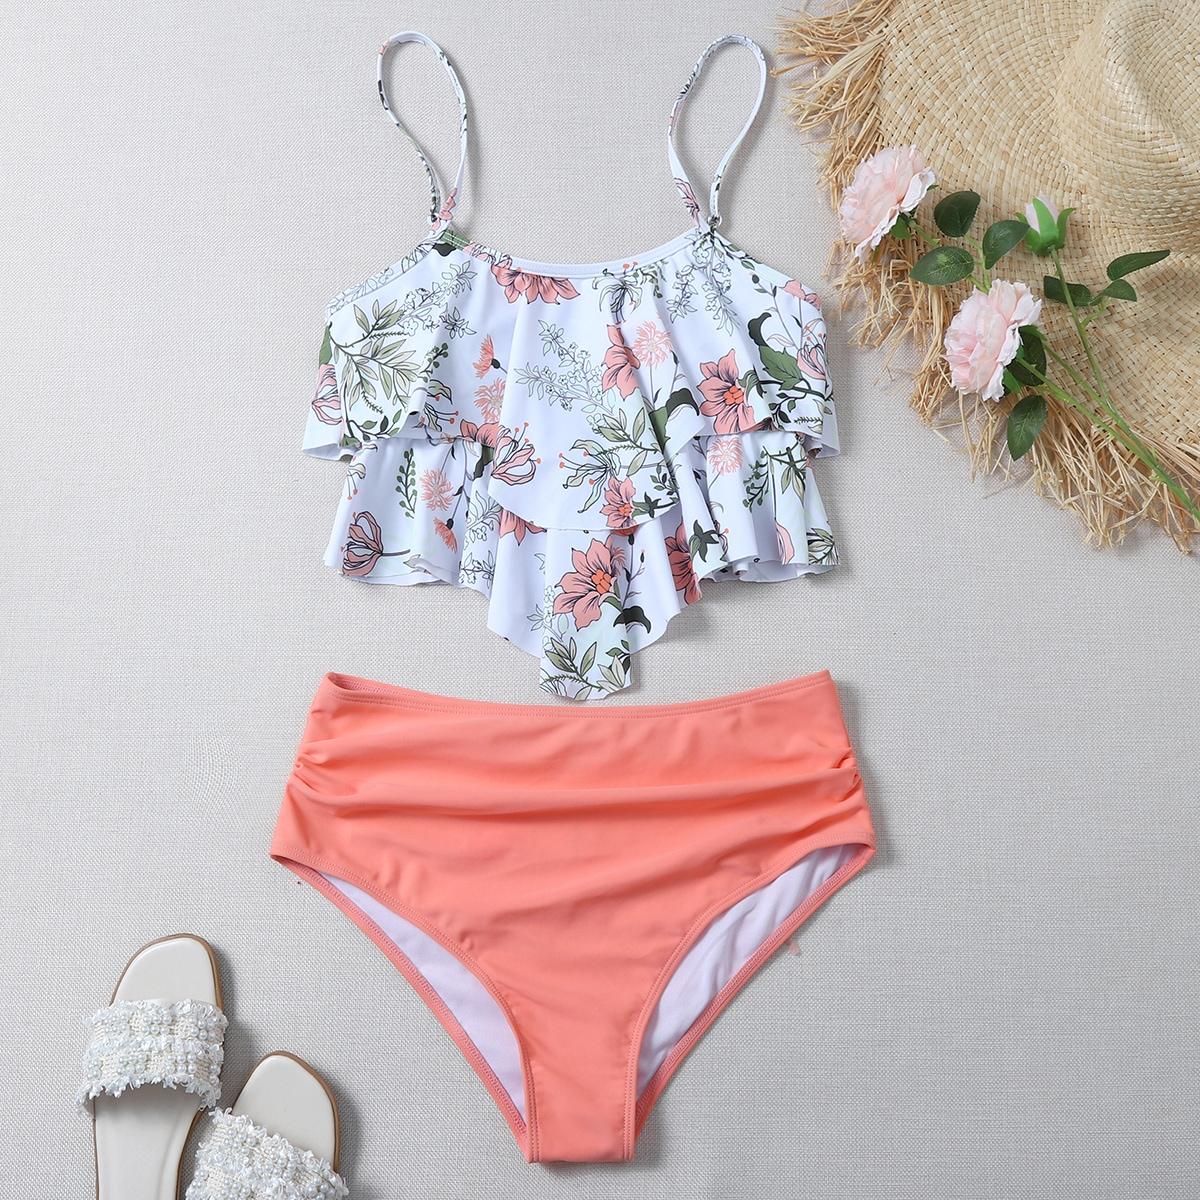 Floral Hanky Hem High Waisted Bikini Swimsuit